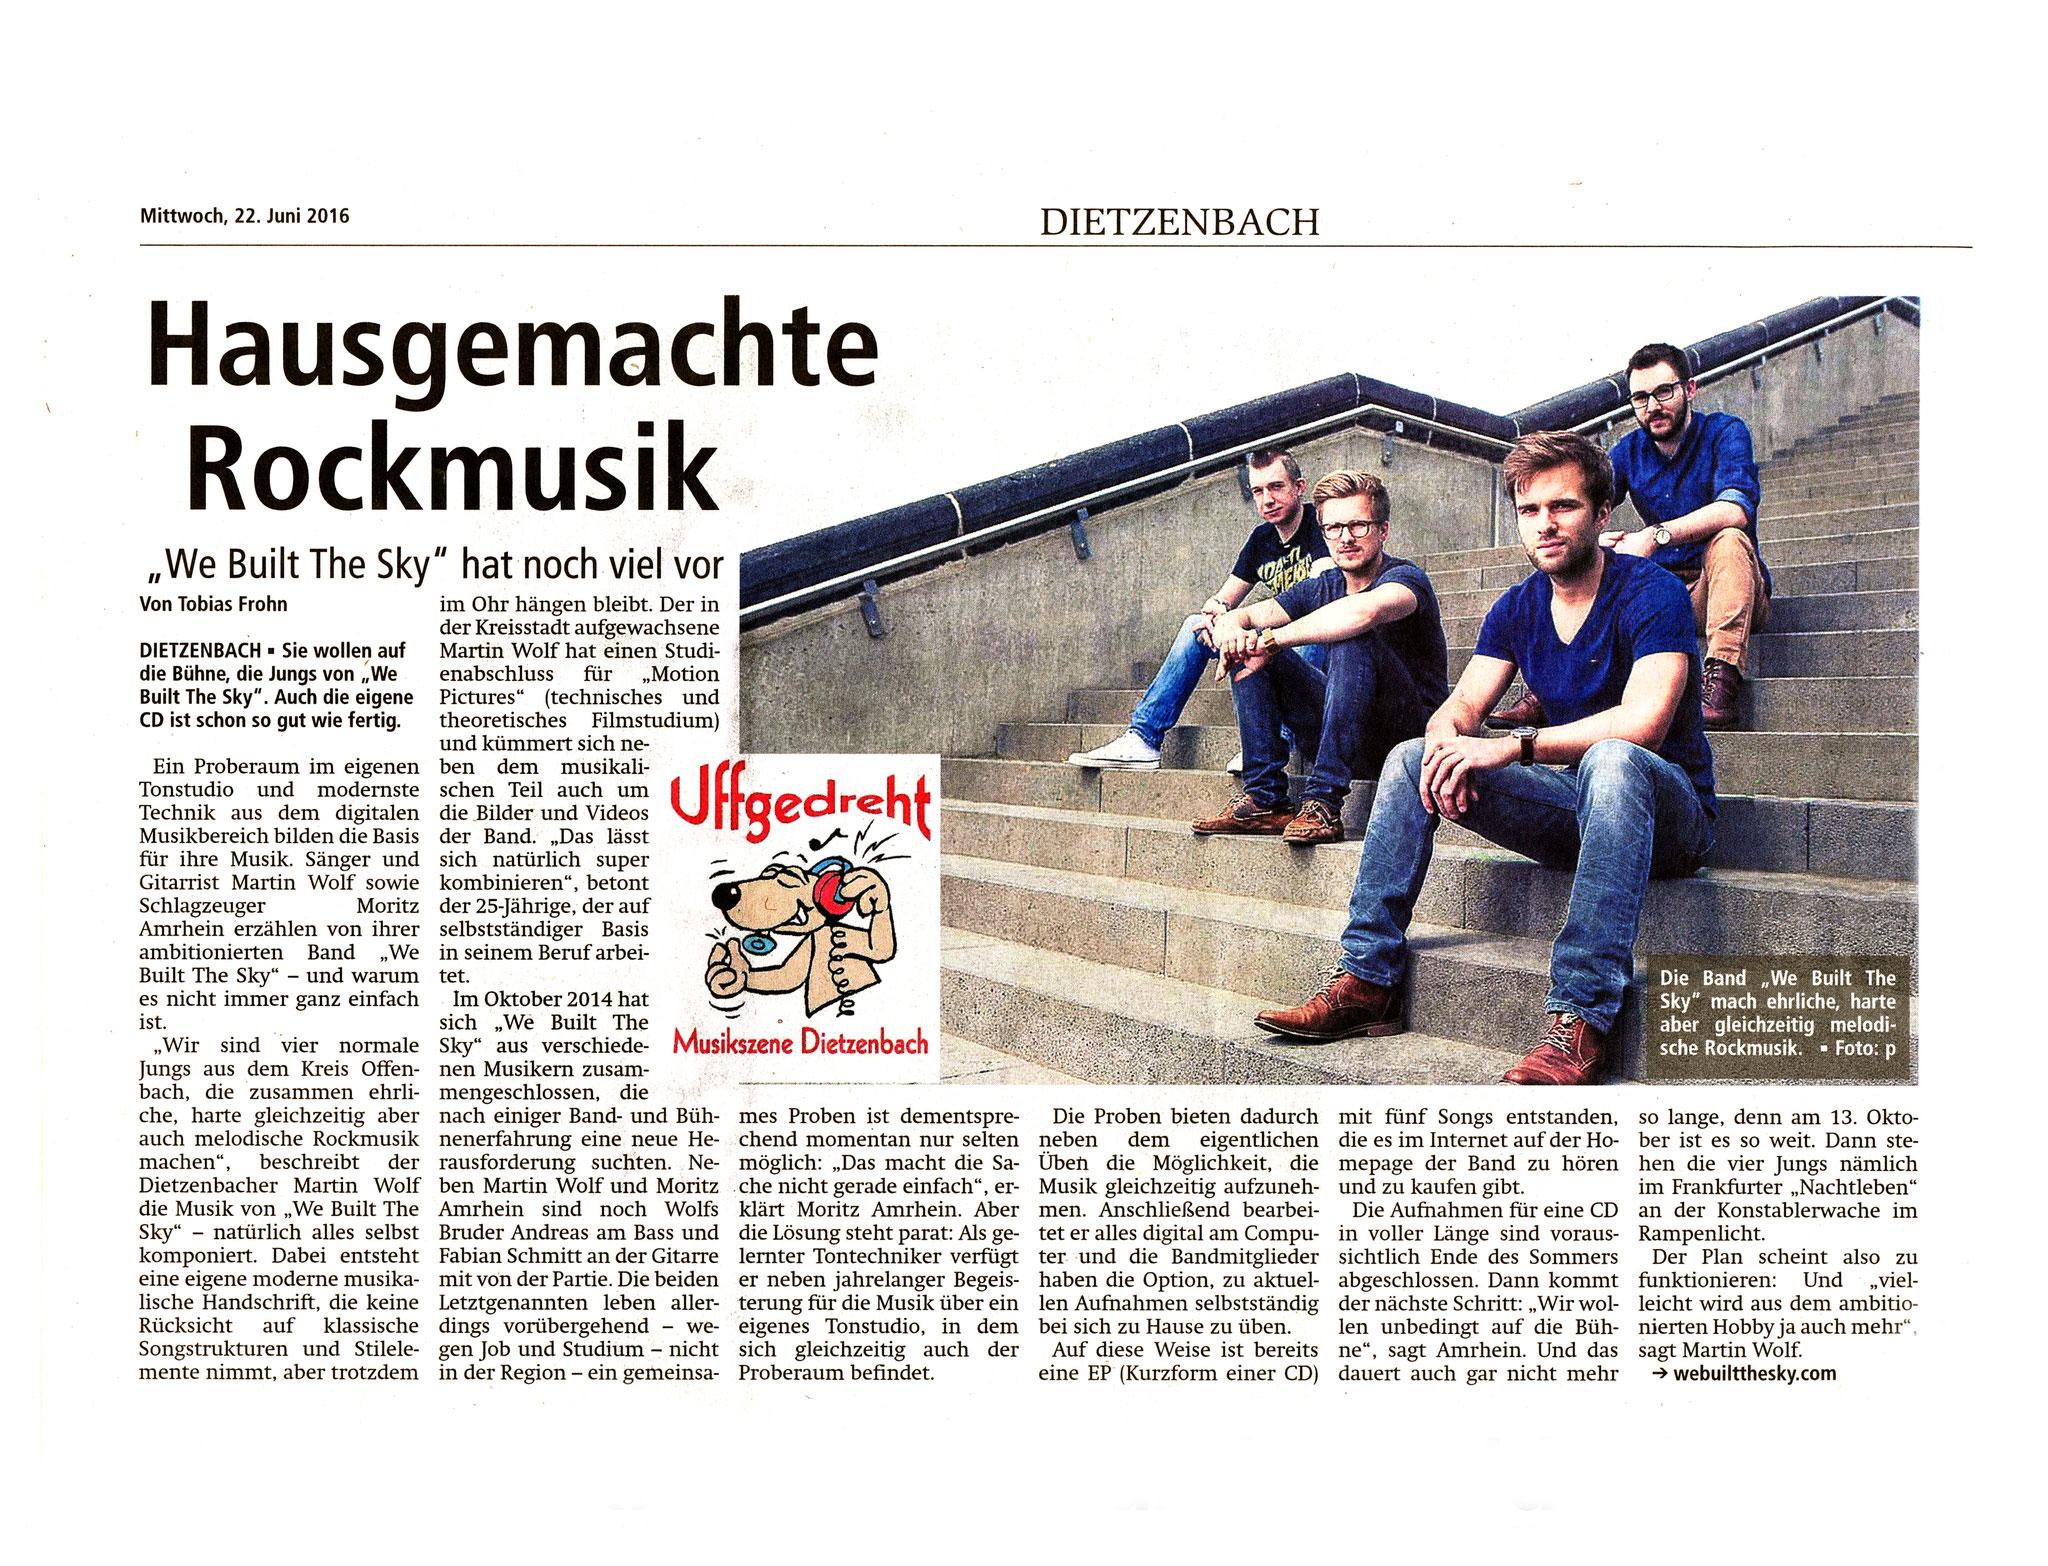 Offenbach Post, 22. Juni 2016